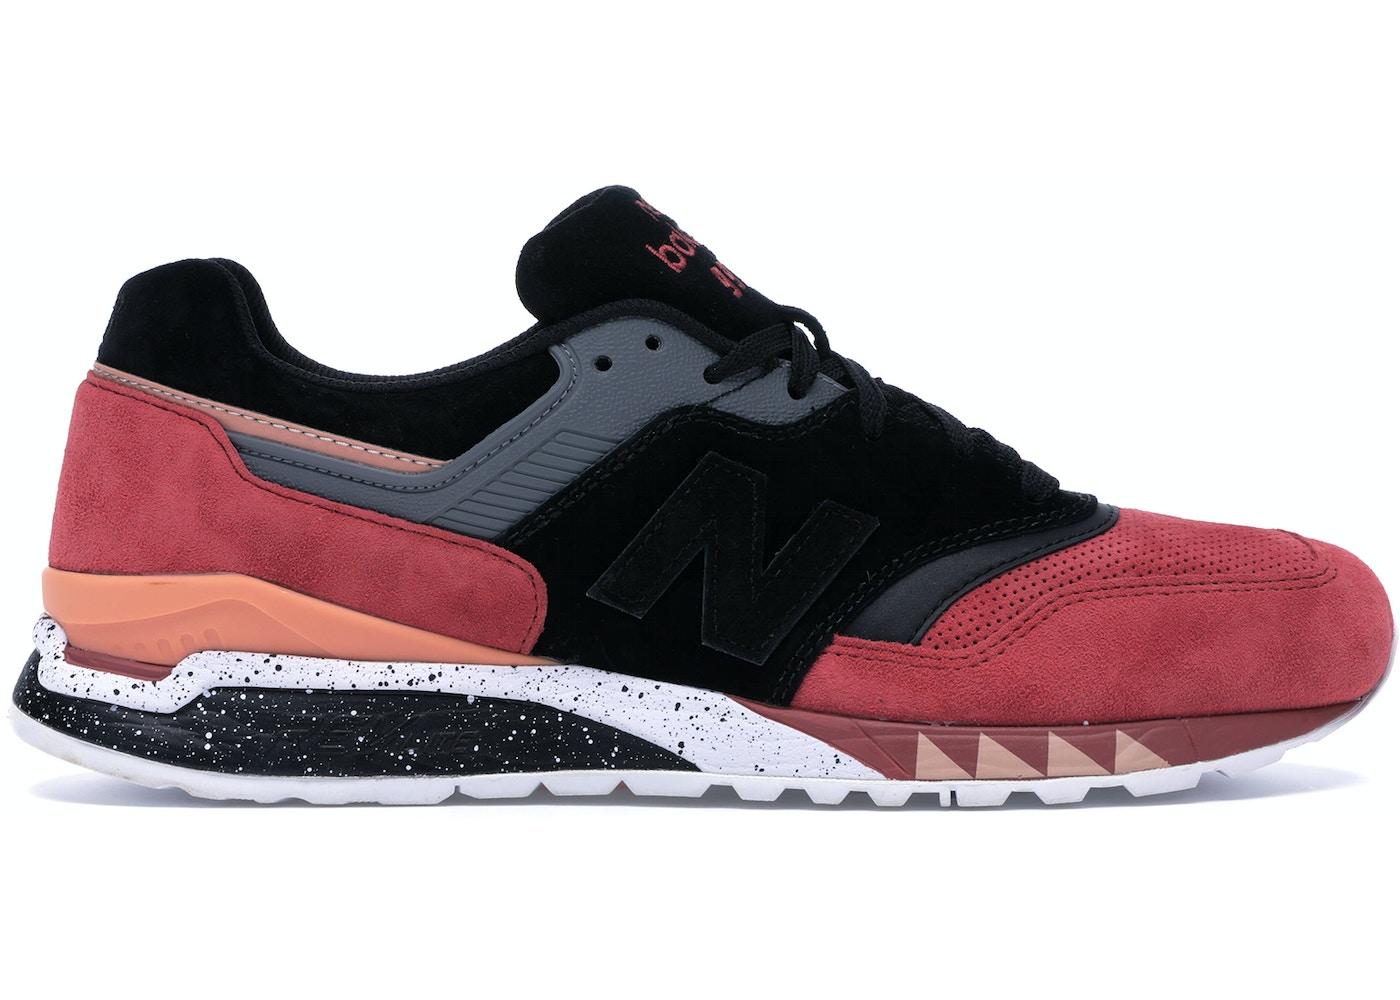 b4c27b2b1d75 New Balance 997.5 Sneaker Freaker Tassie Tiger - ML997HSF